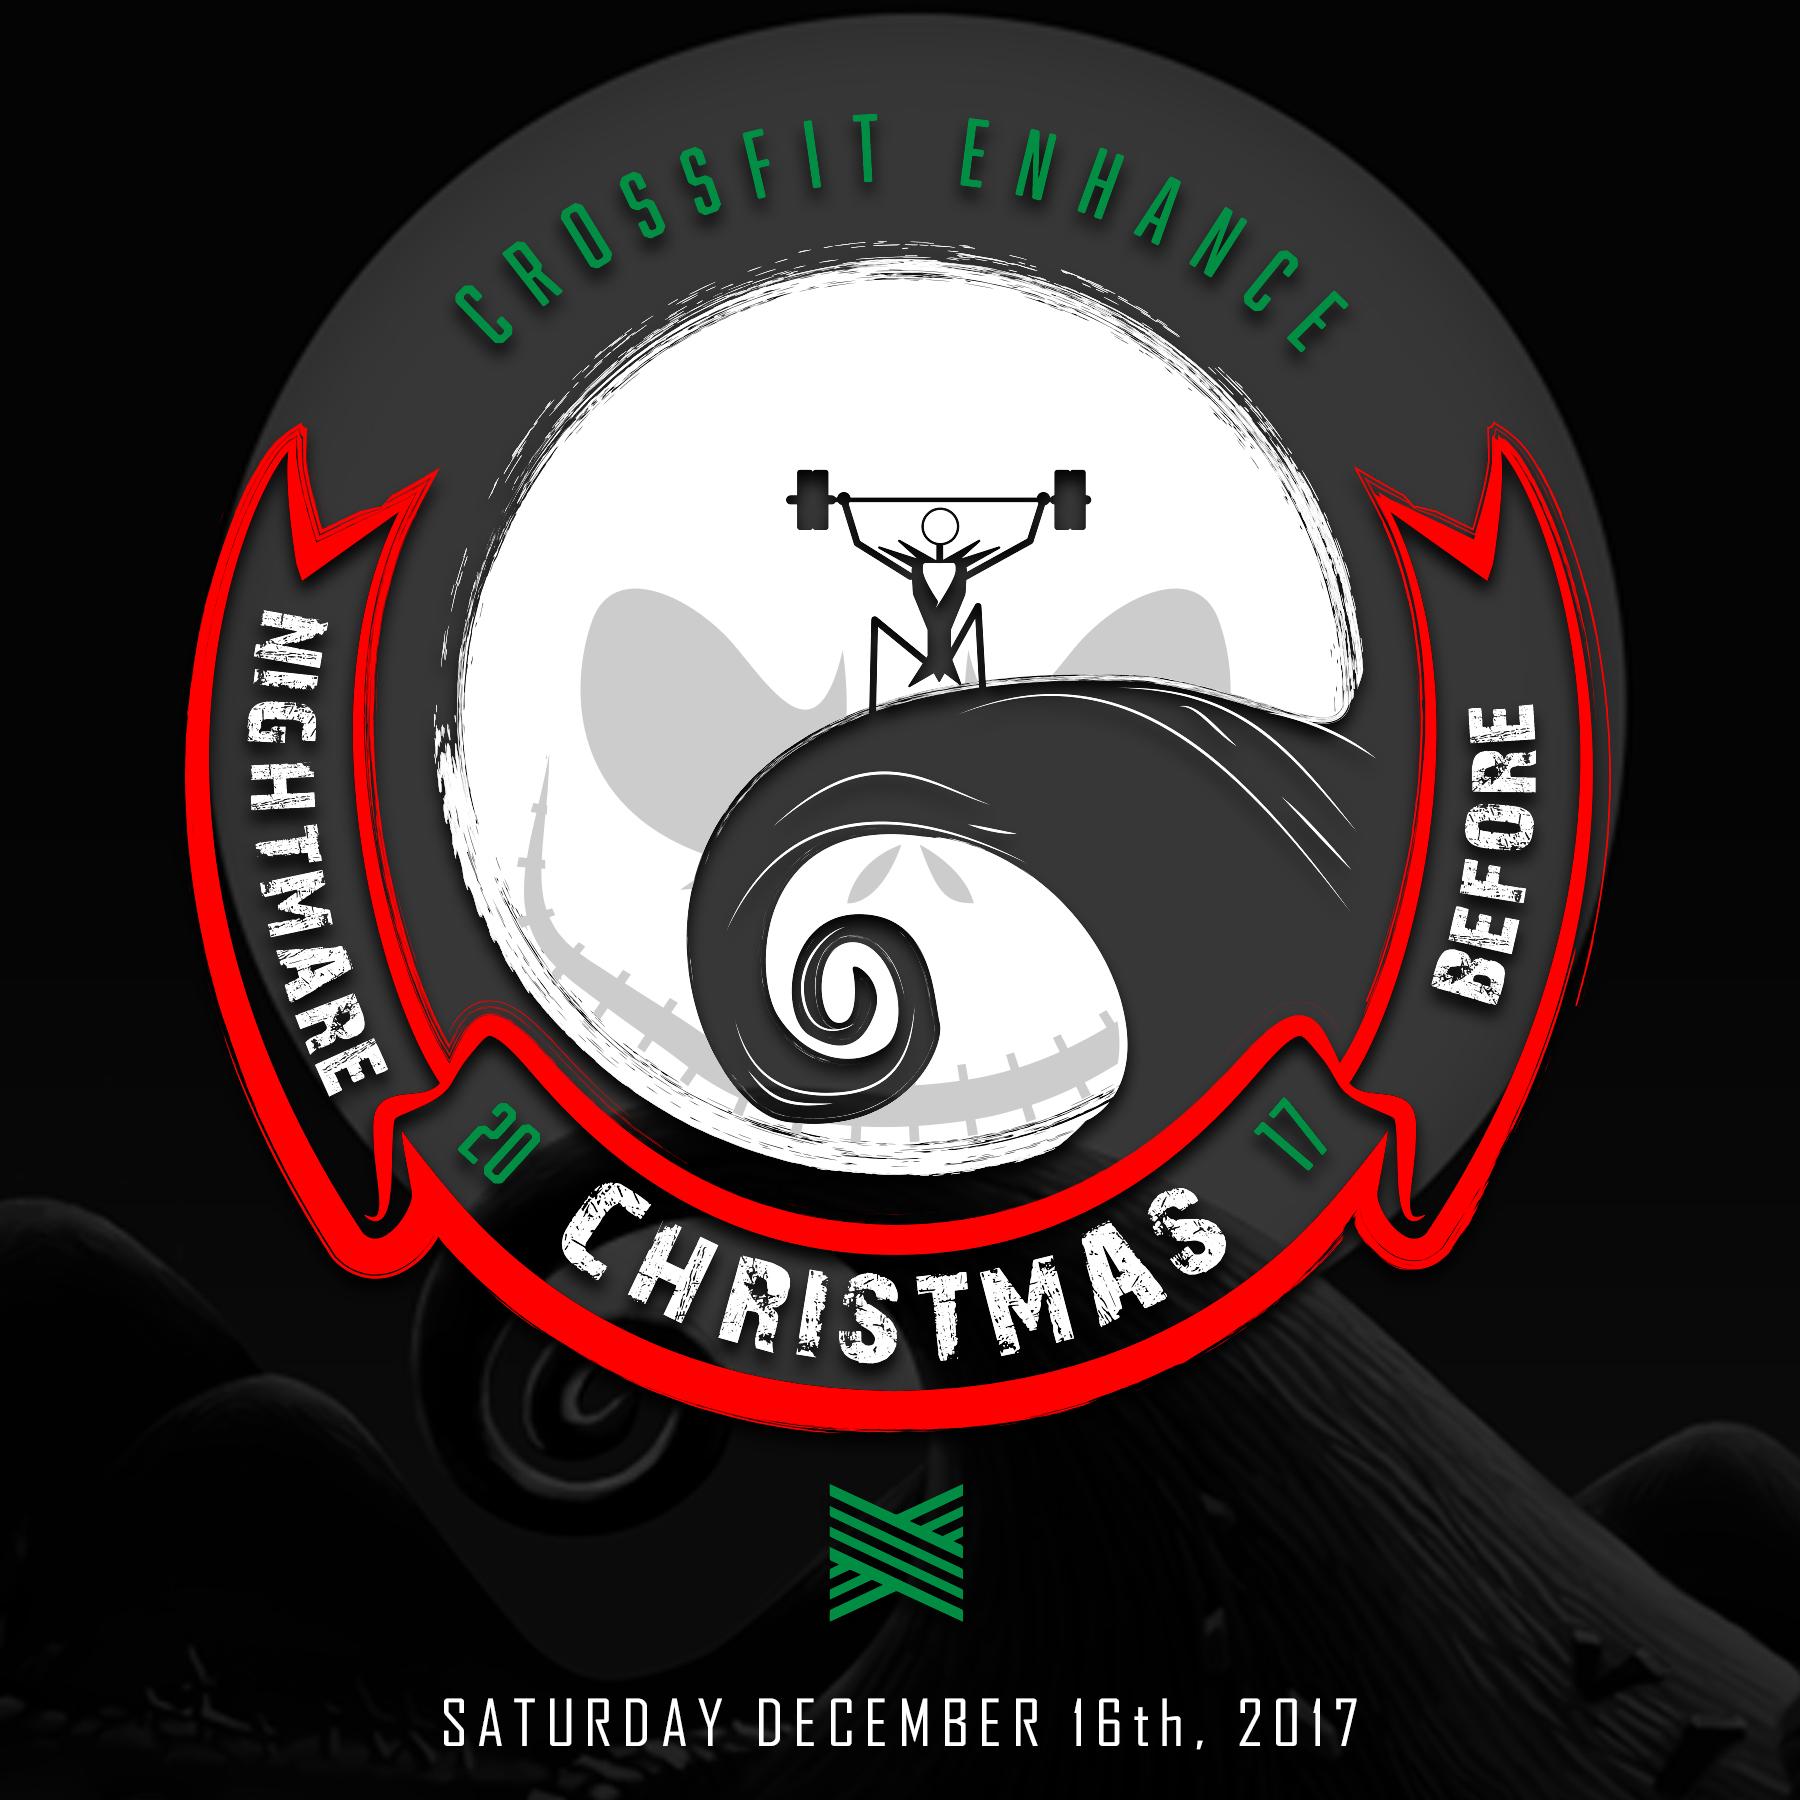 CFE\'S NIGHTMARE BEFORE CHRISTMAS — Crossfit Enhance